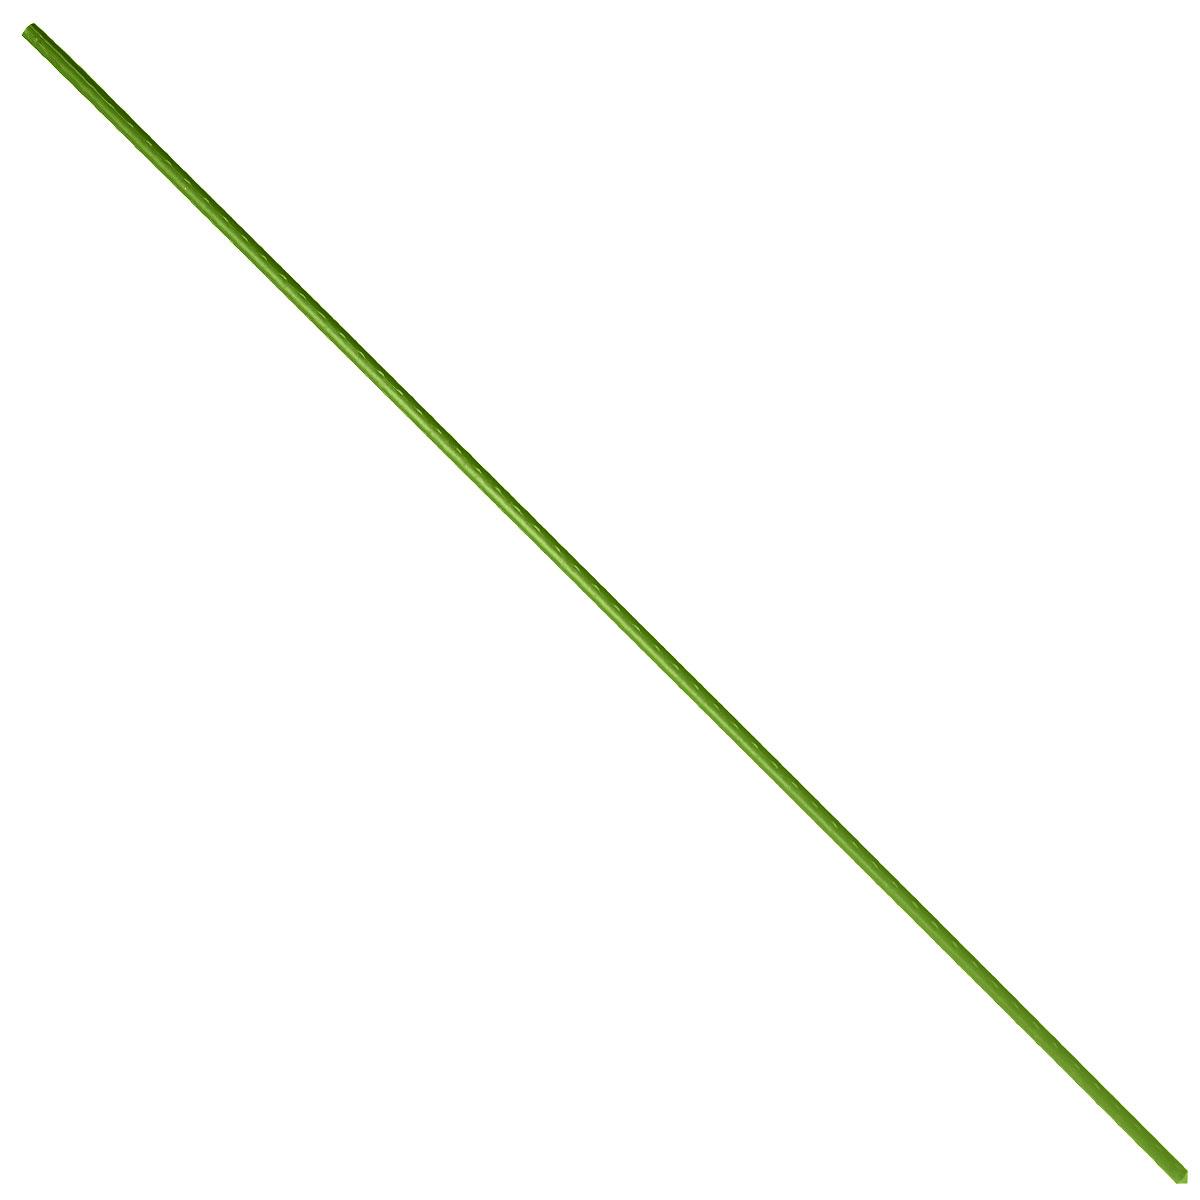 Опора для растений Green Apple, цвет: зеленый, диаметр 0,8 см, длина 90 см, 5 шт чехол для садовых растений green apple 100х50см